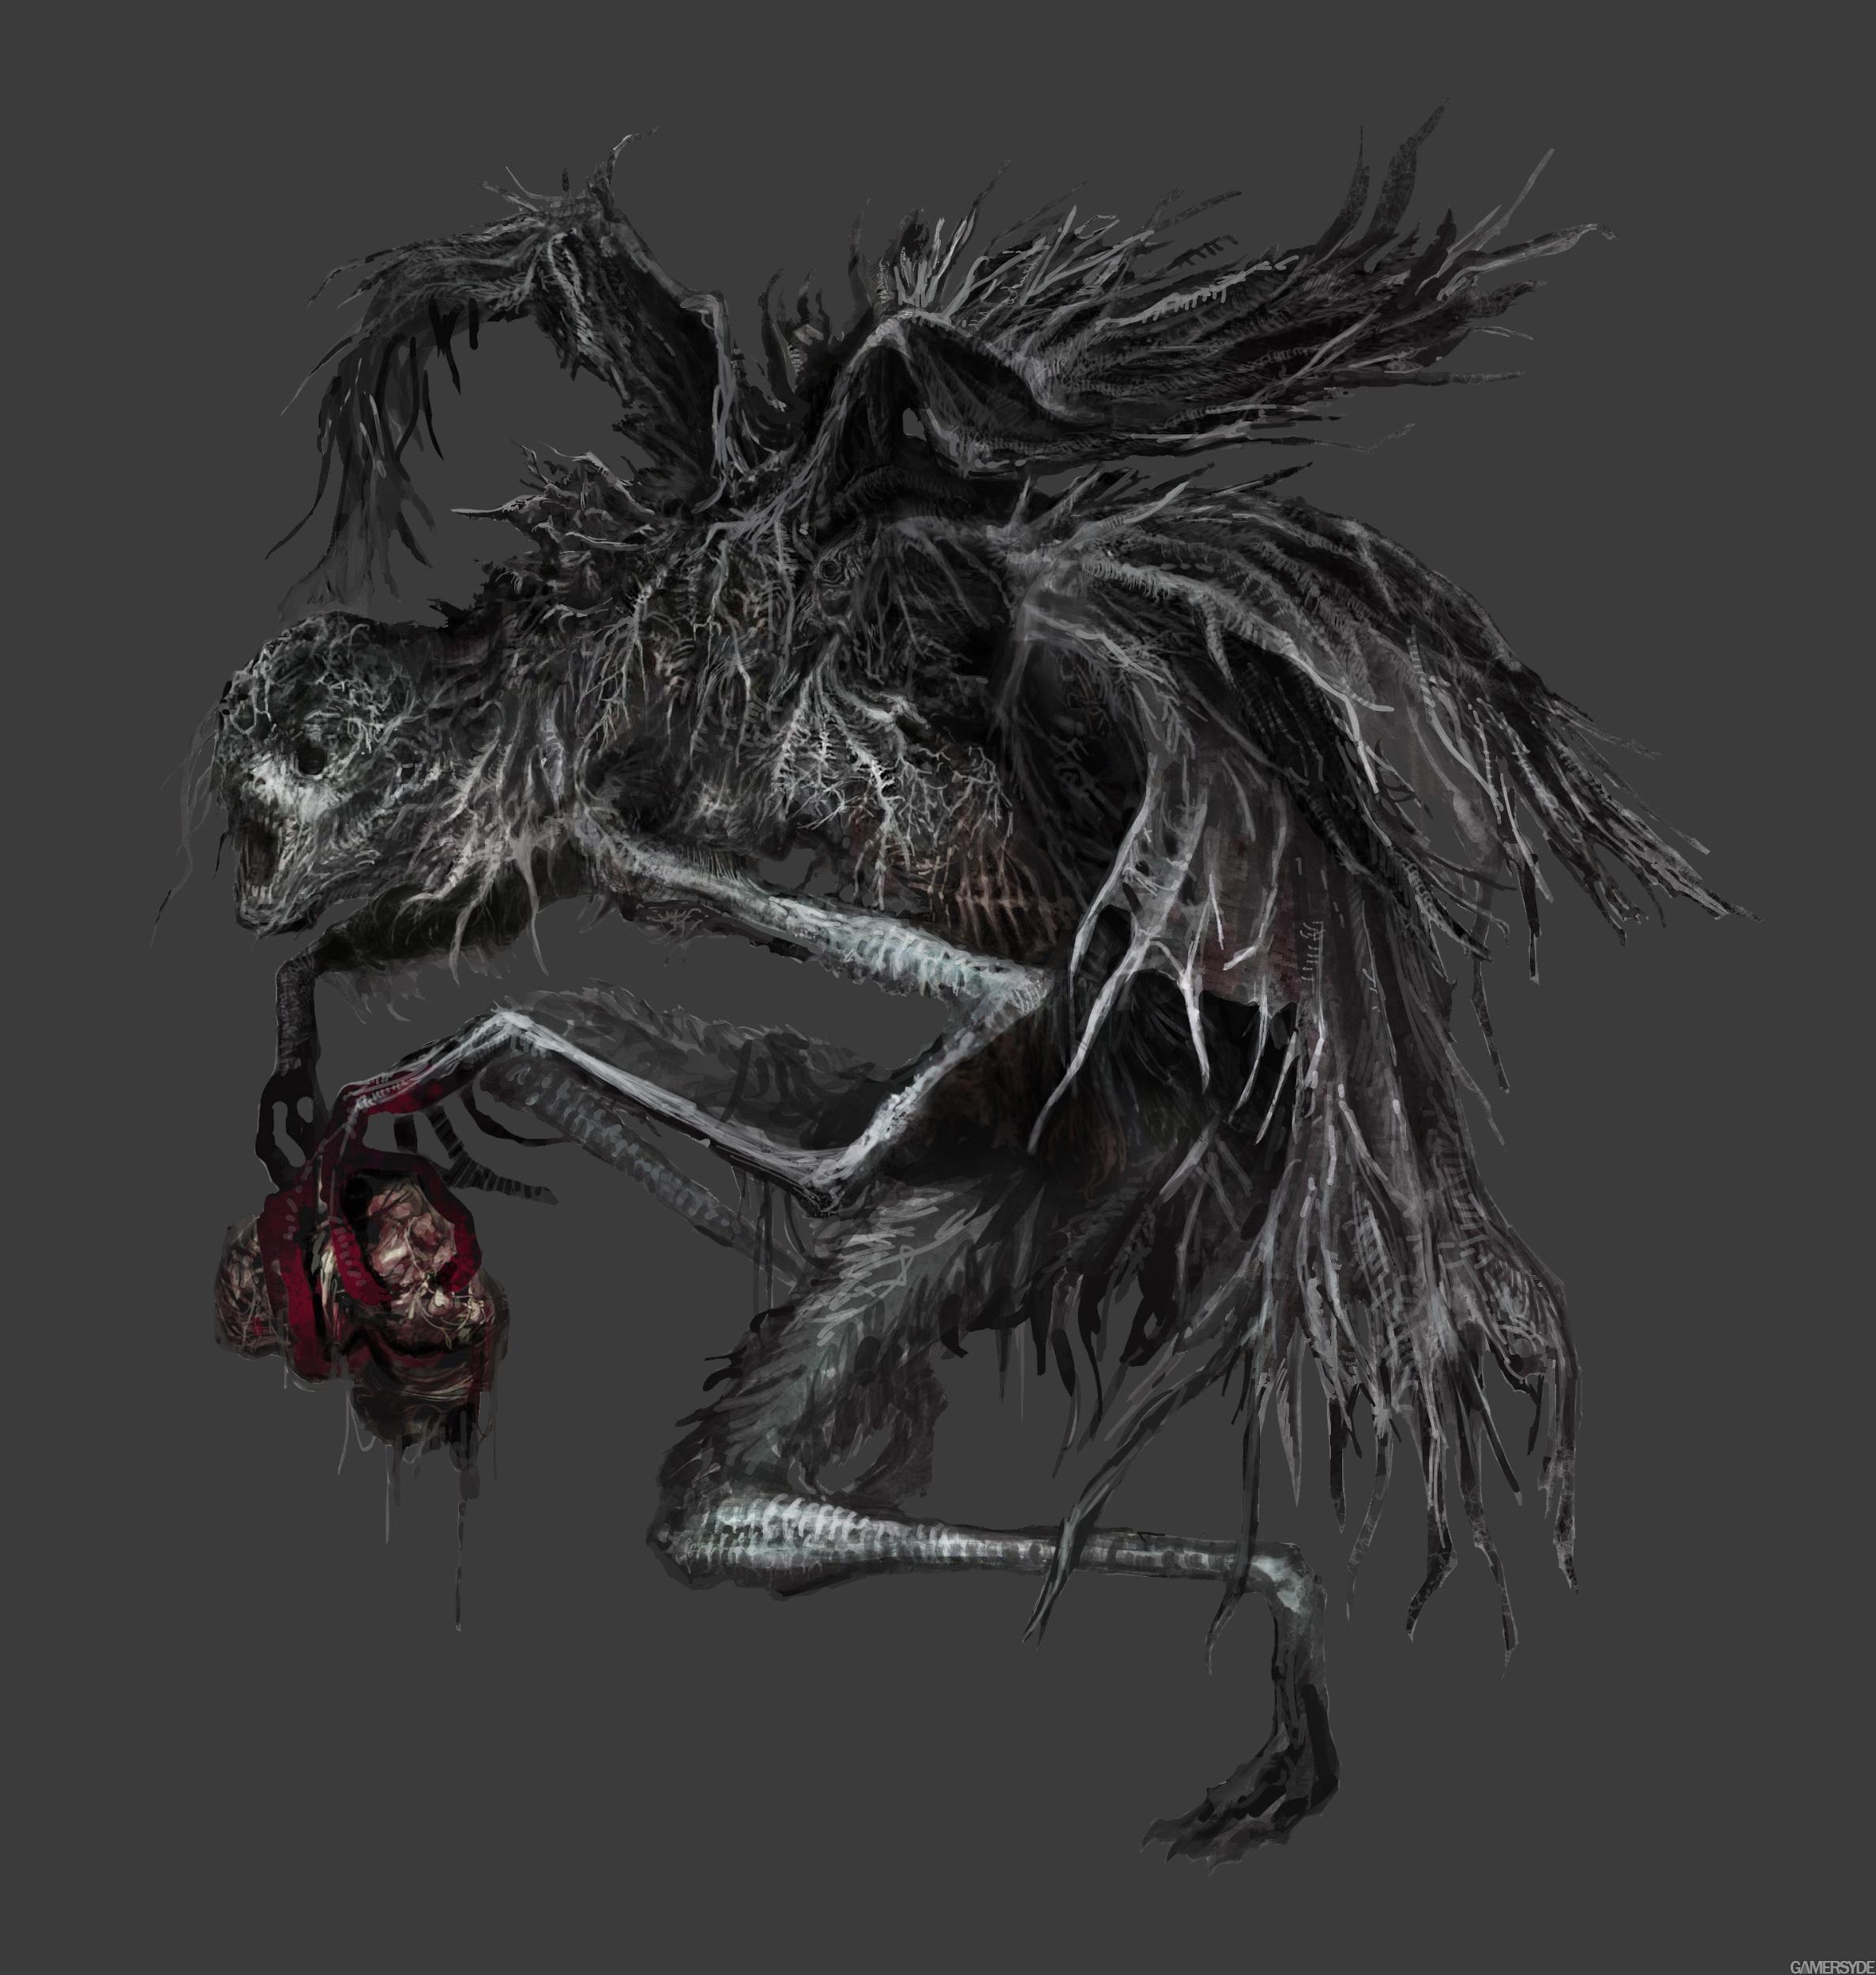 image_dark_souls_iii-28581-3267_0005.jpg